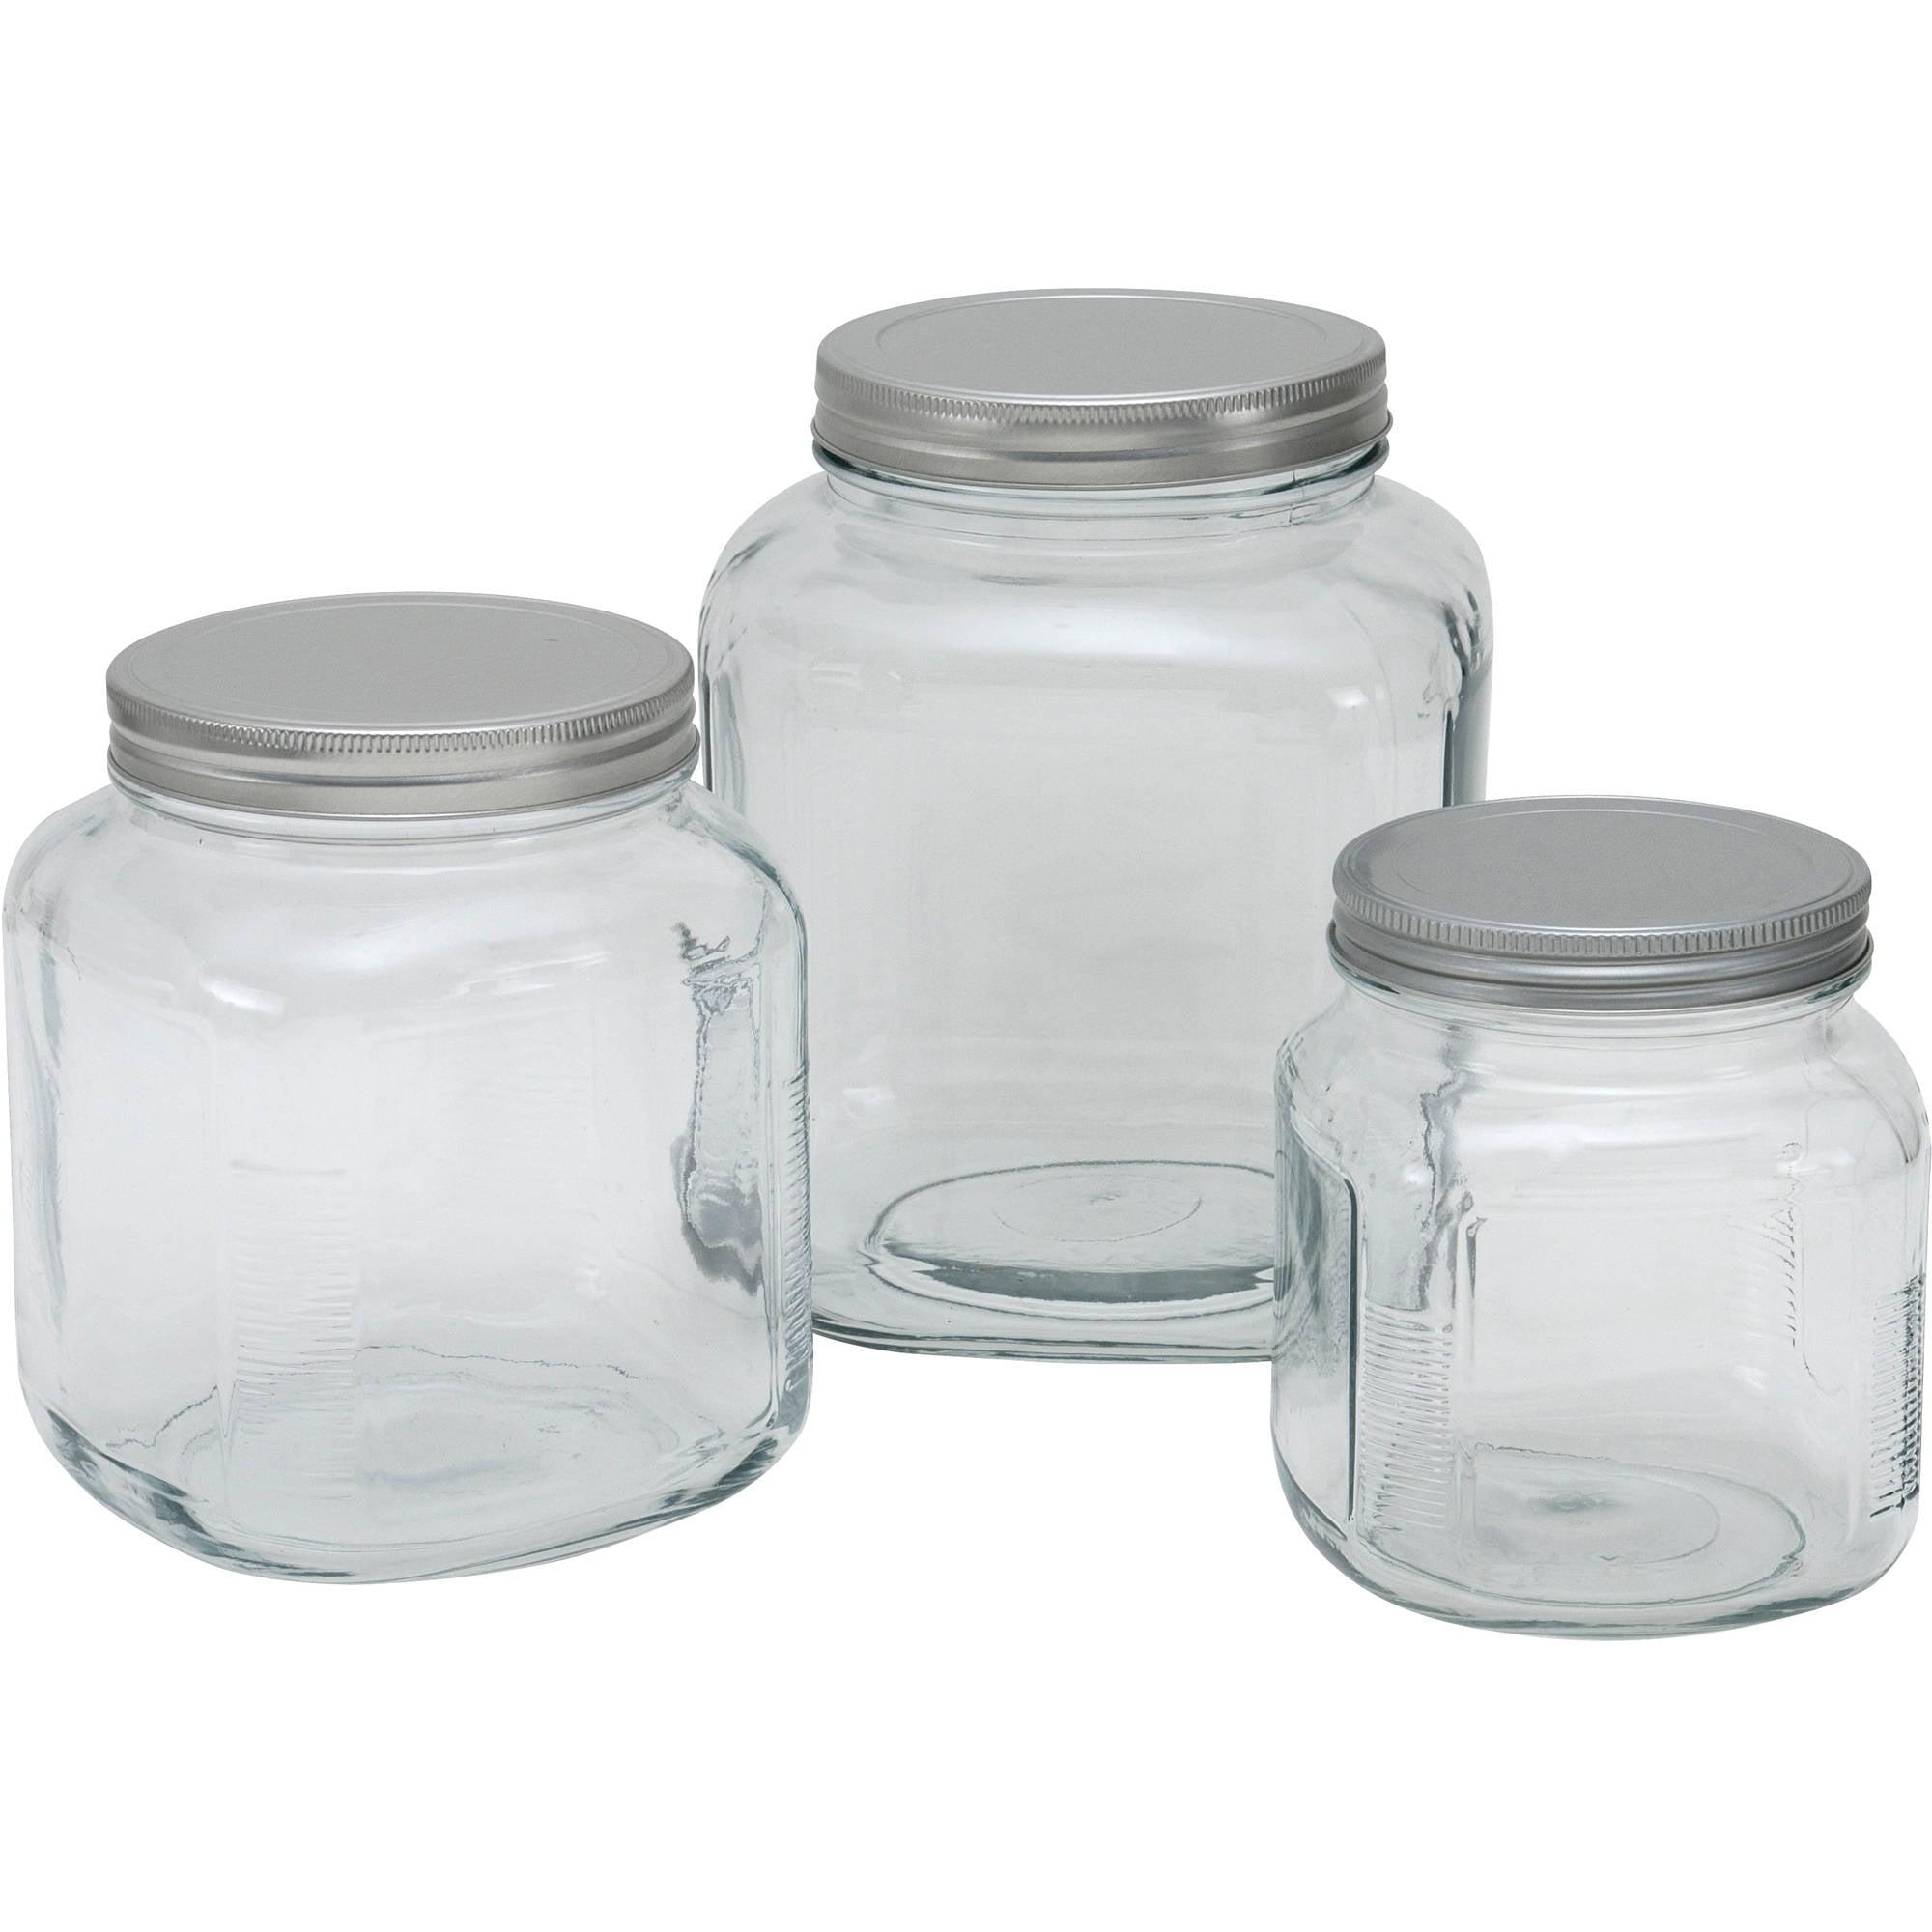 Anchor Hocking Cracker Jar With Lid Walmartcom